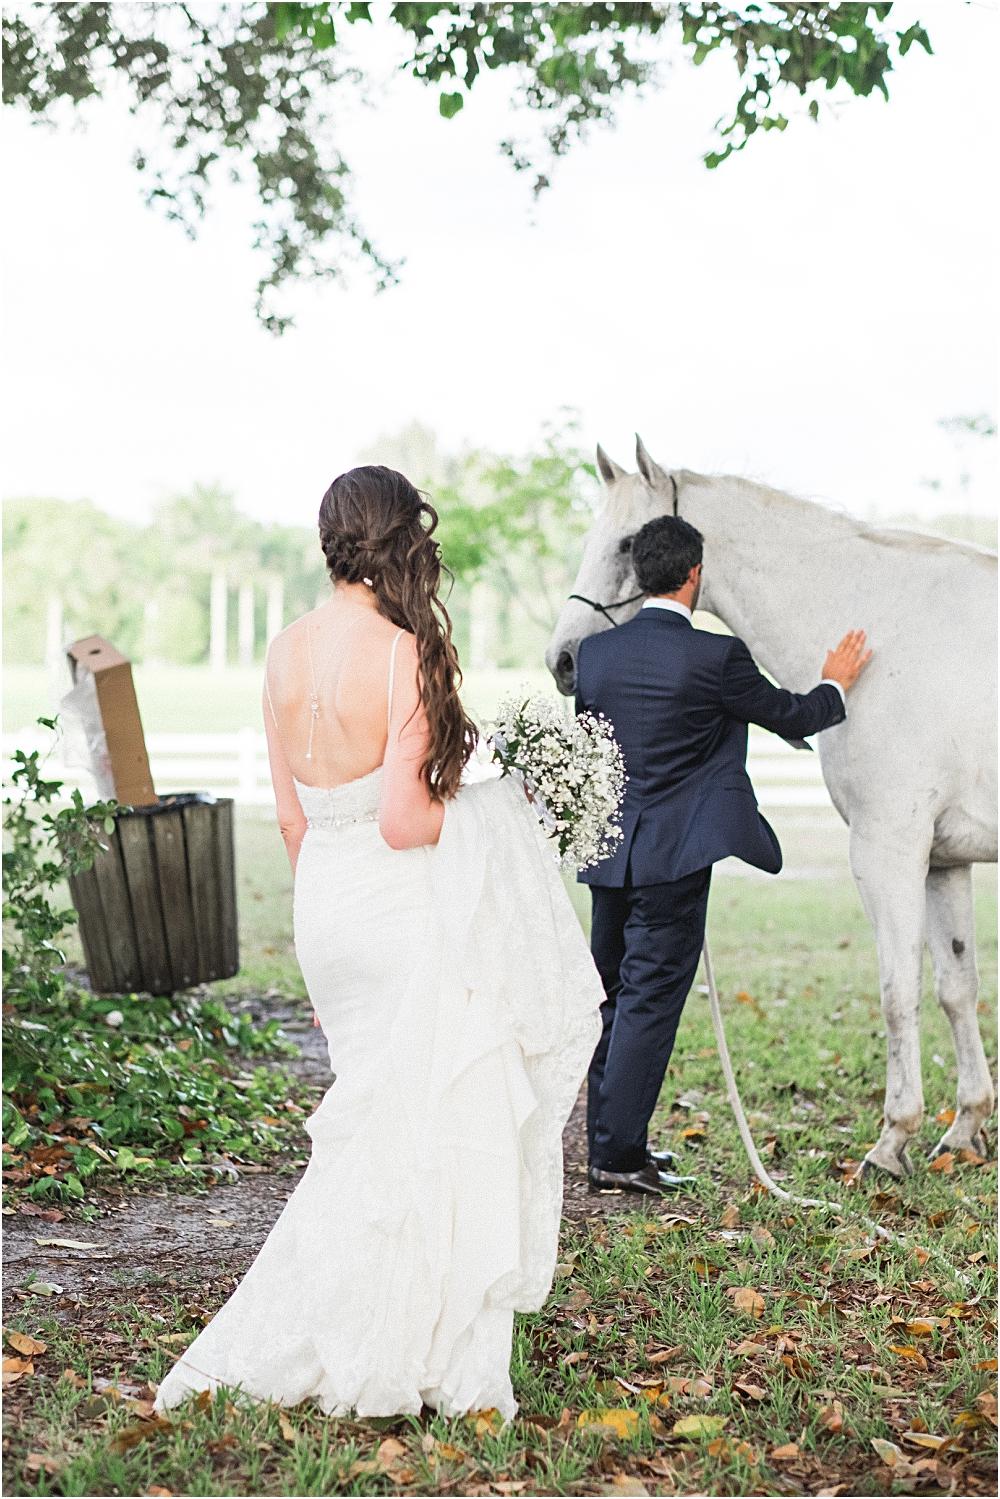 miami-wedding-photographer-rustic-outdoor_0425.jpg